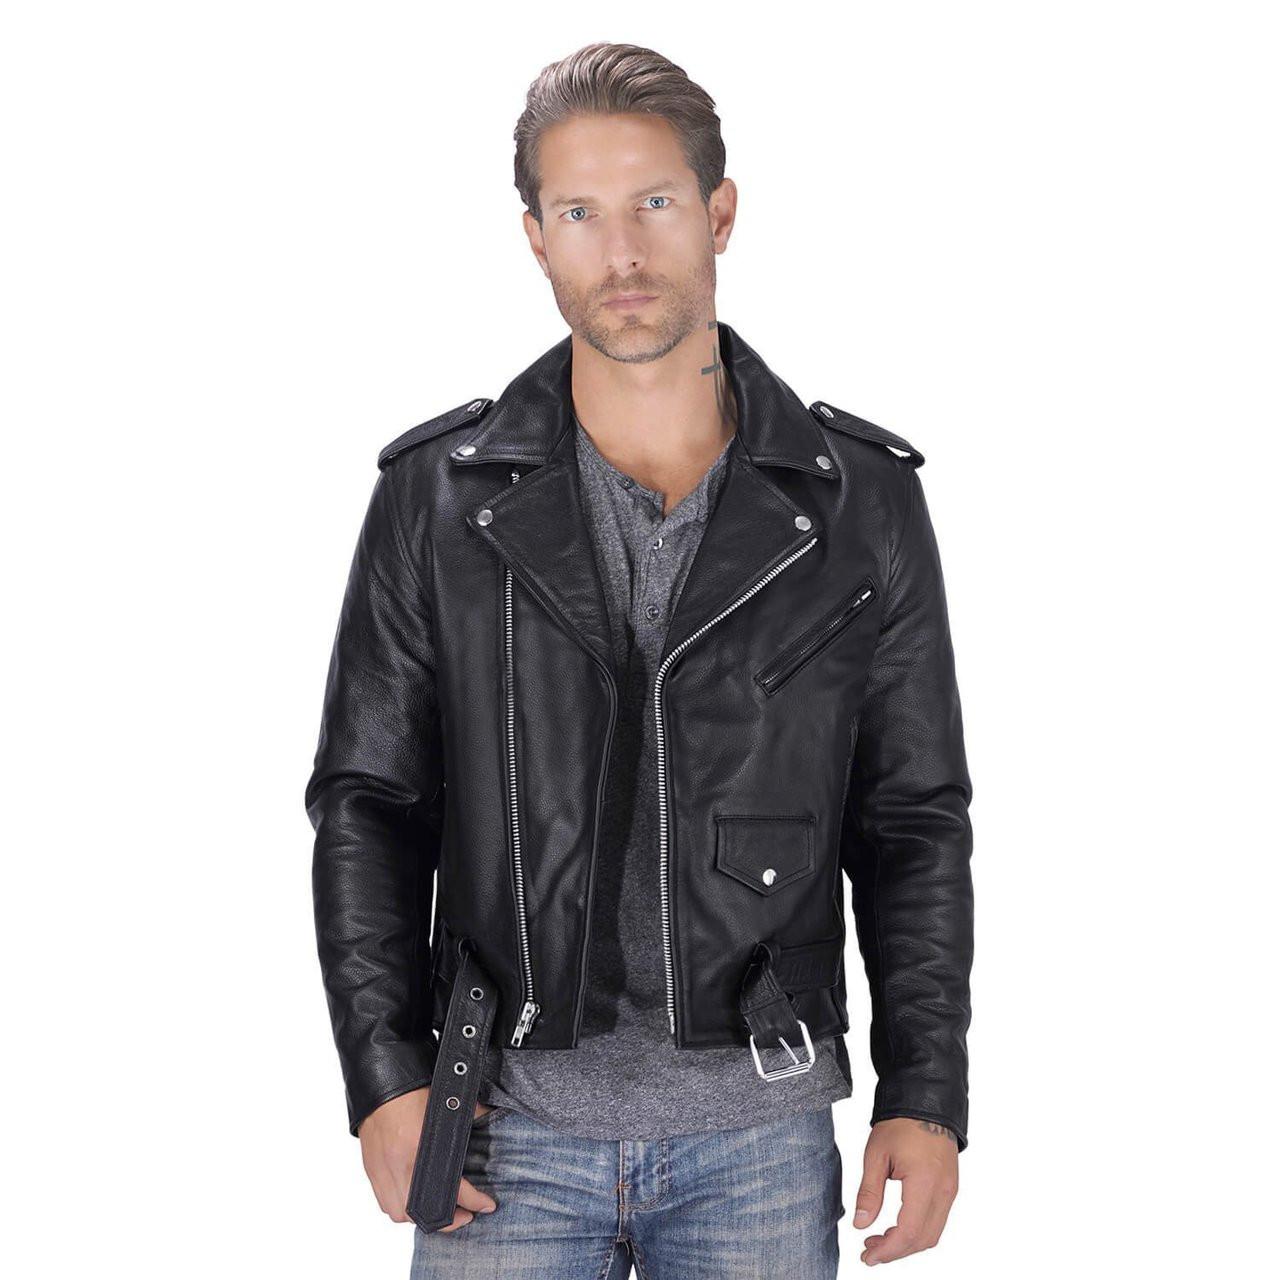 e0824aa5d Nomad USA Classic Leather Biker Jacket